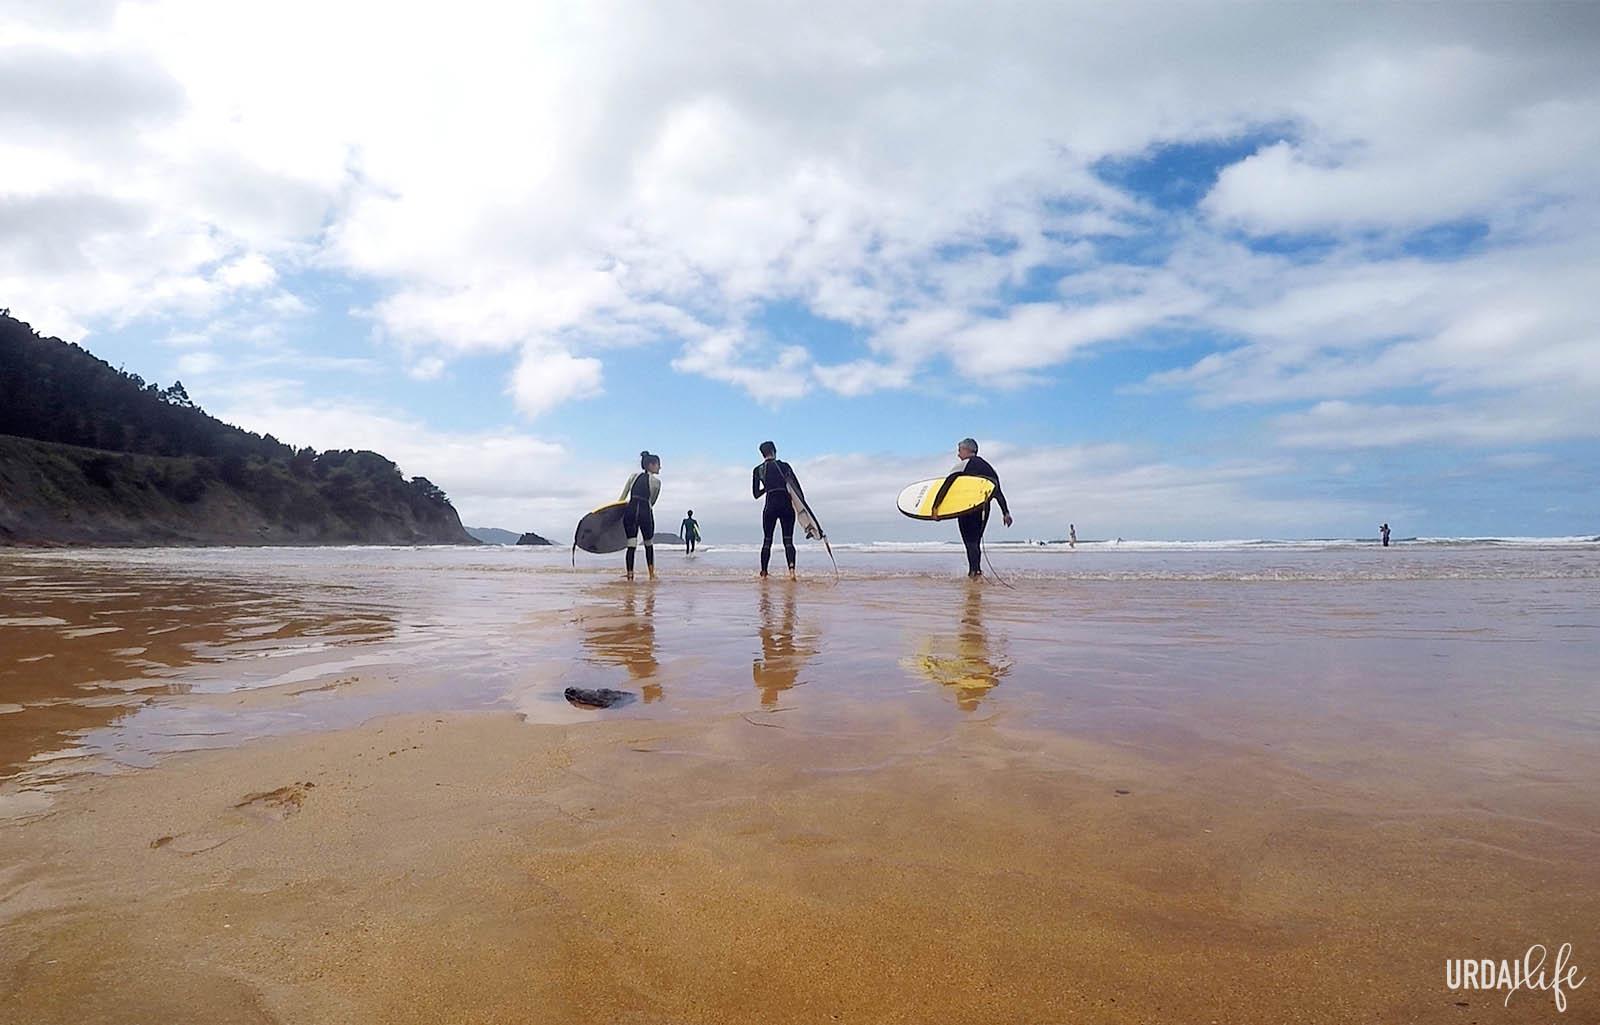 Clases de surf en la playa de Laga, Ibarrangelu